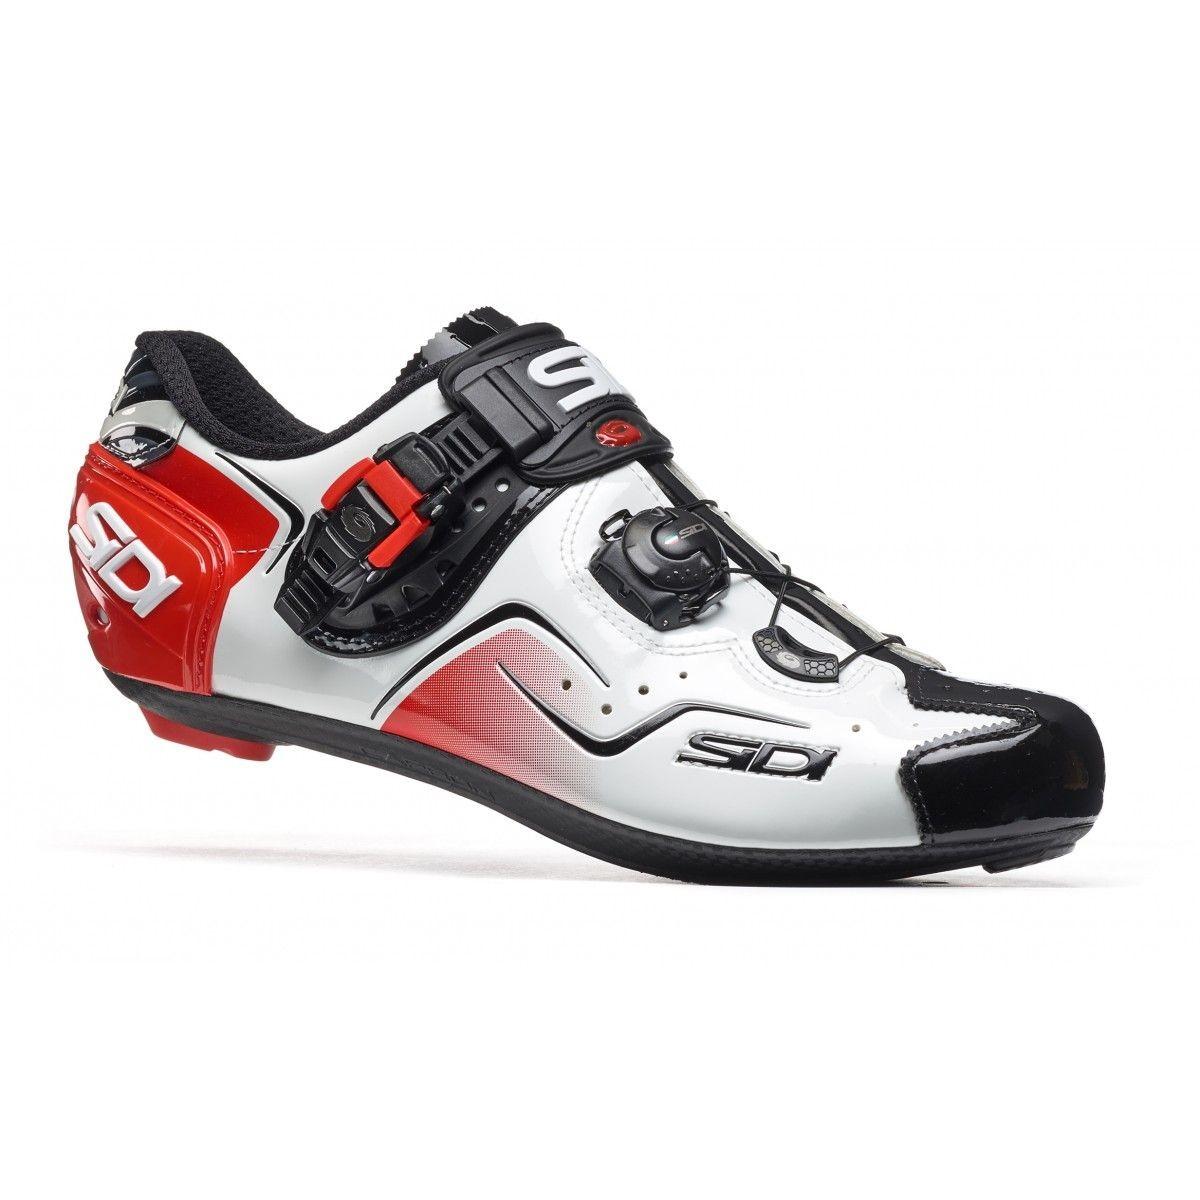 f278c8b3ff3 Chaussures Route Kaos Cyclisme Sidi - Taille   45 42 46